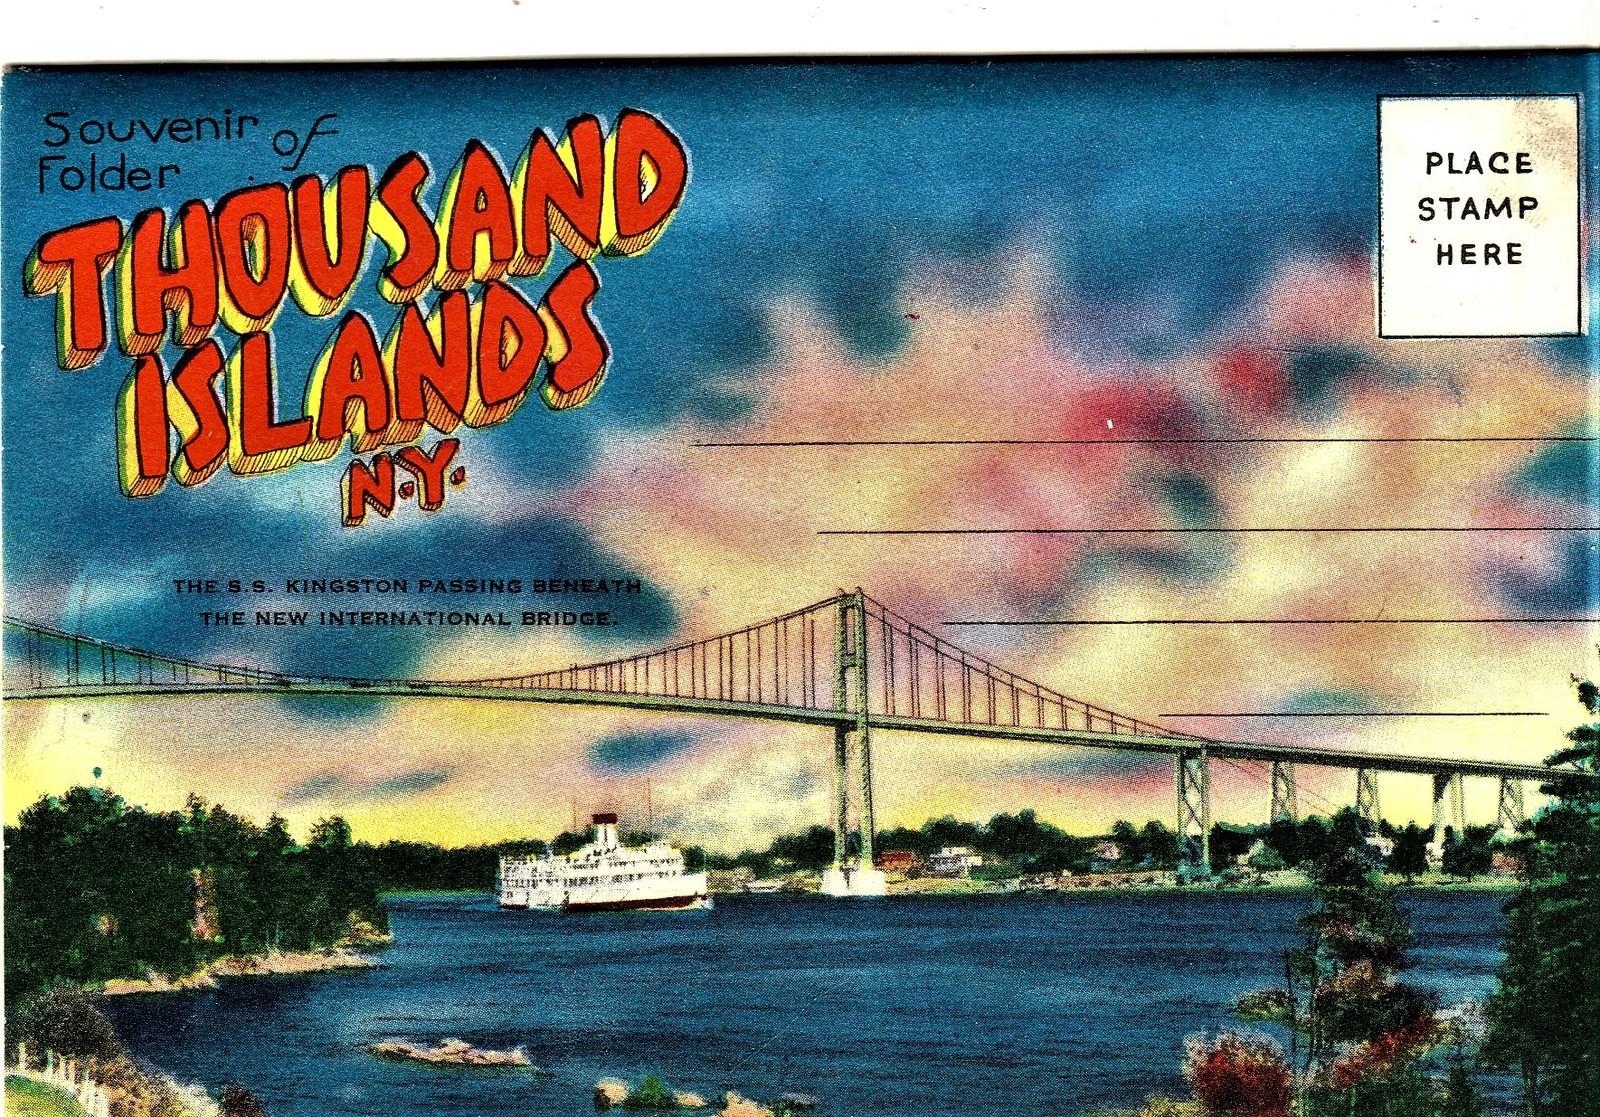 Thousand Islands Venice Of America Book & Souvenir Photo Booklet image 5